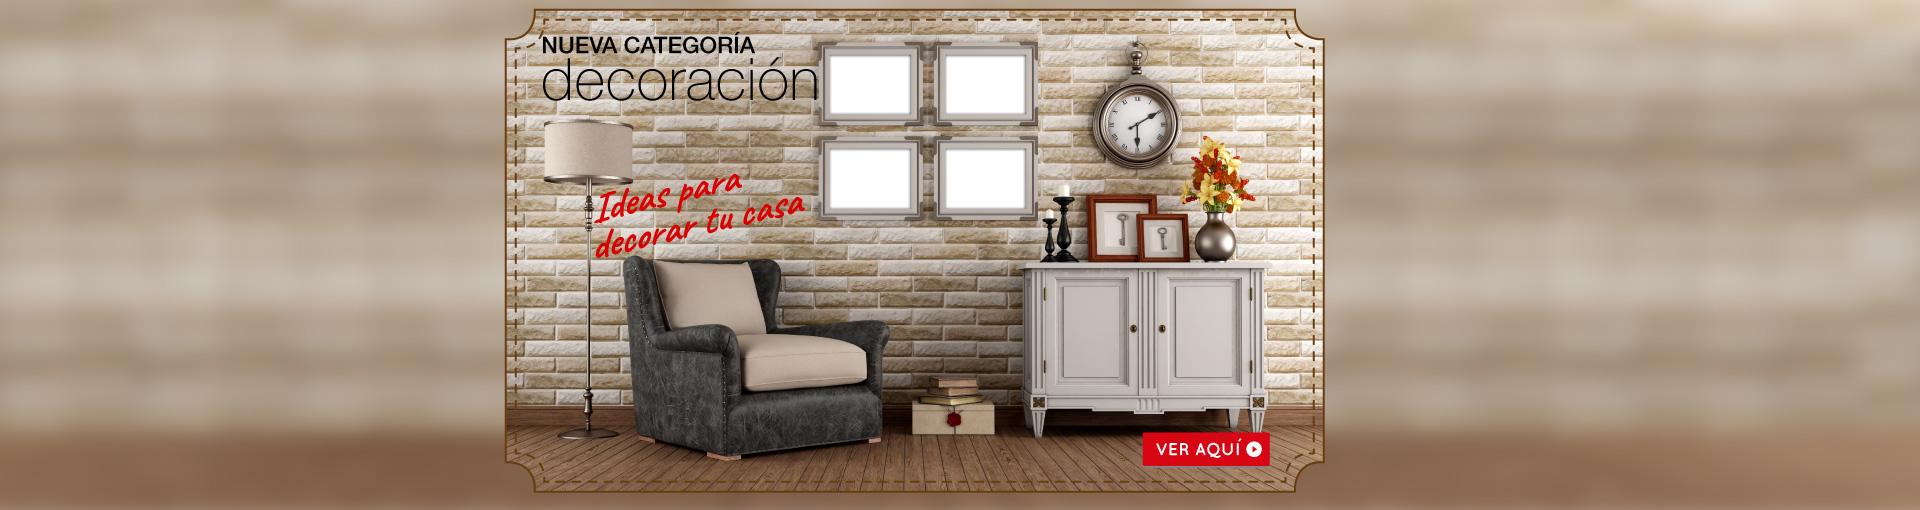 h-decoracion-1920x510